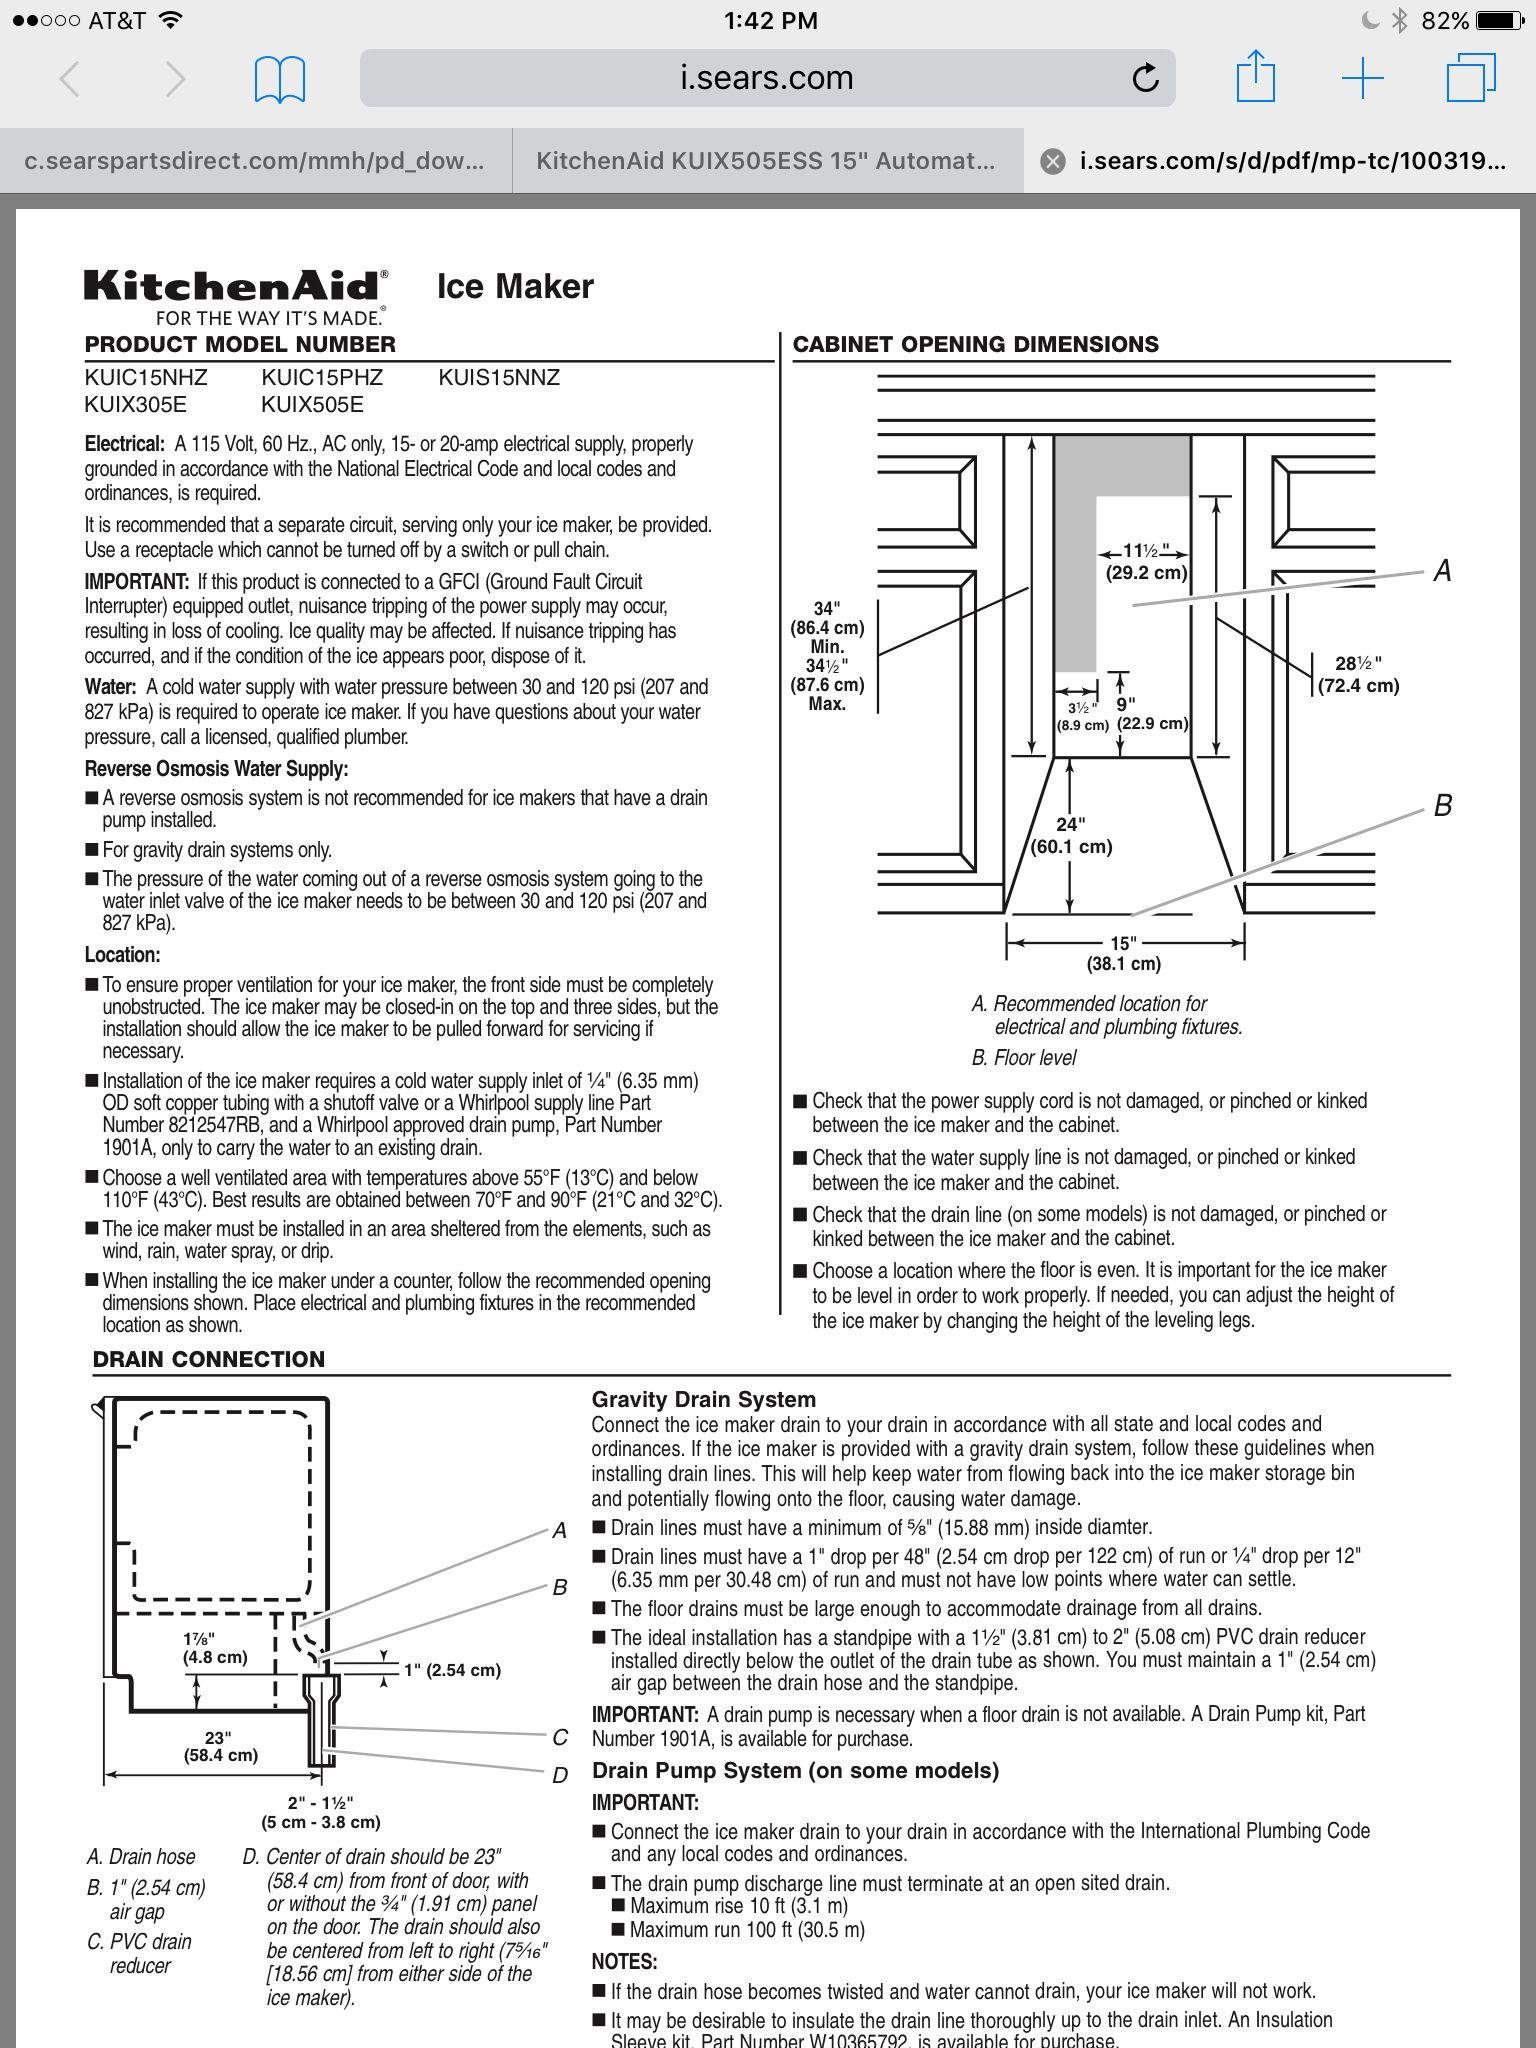 Kitchen aid ice maker 15inch kuix505essi ice maker